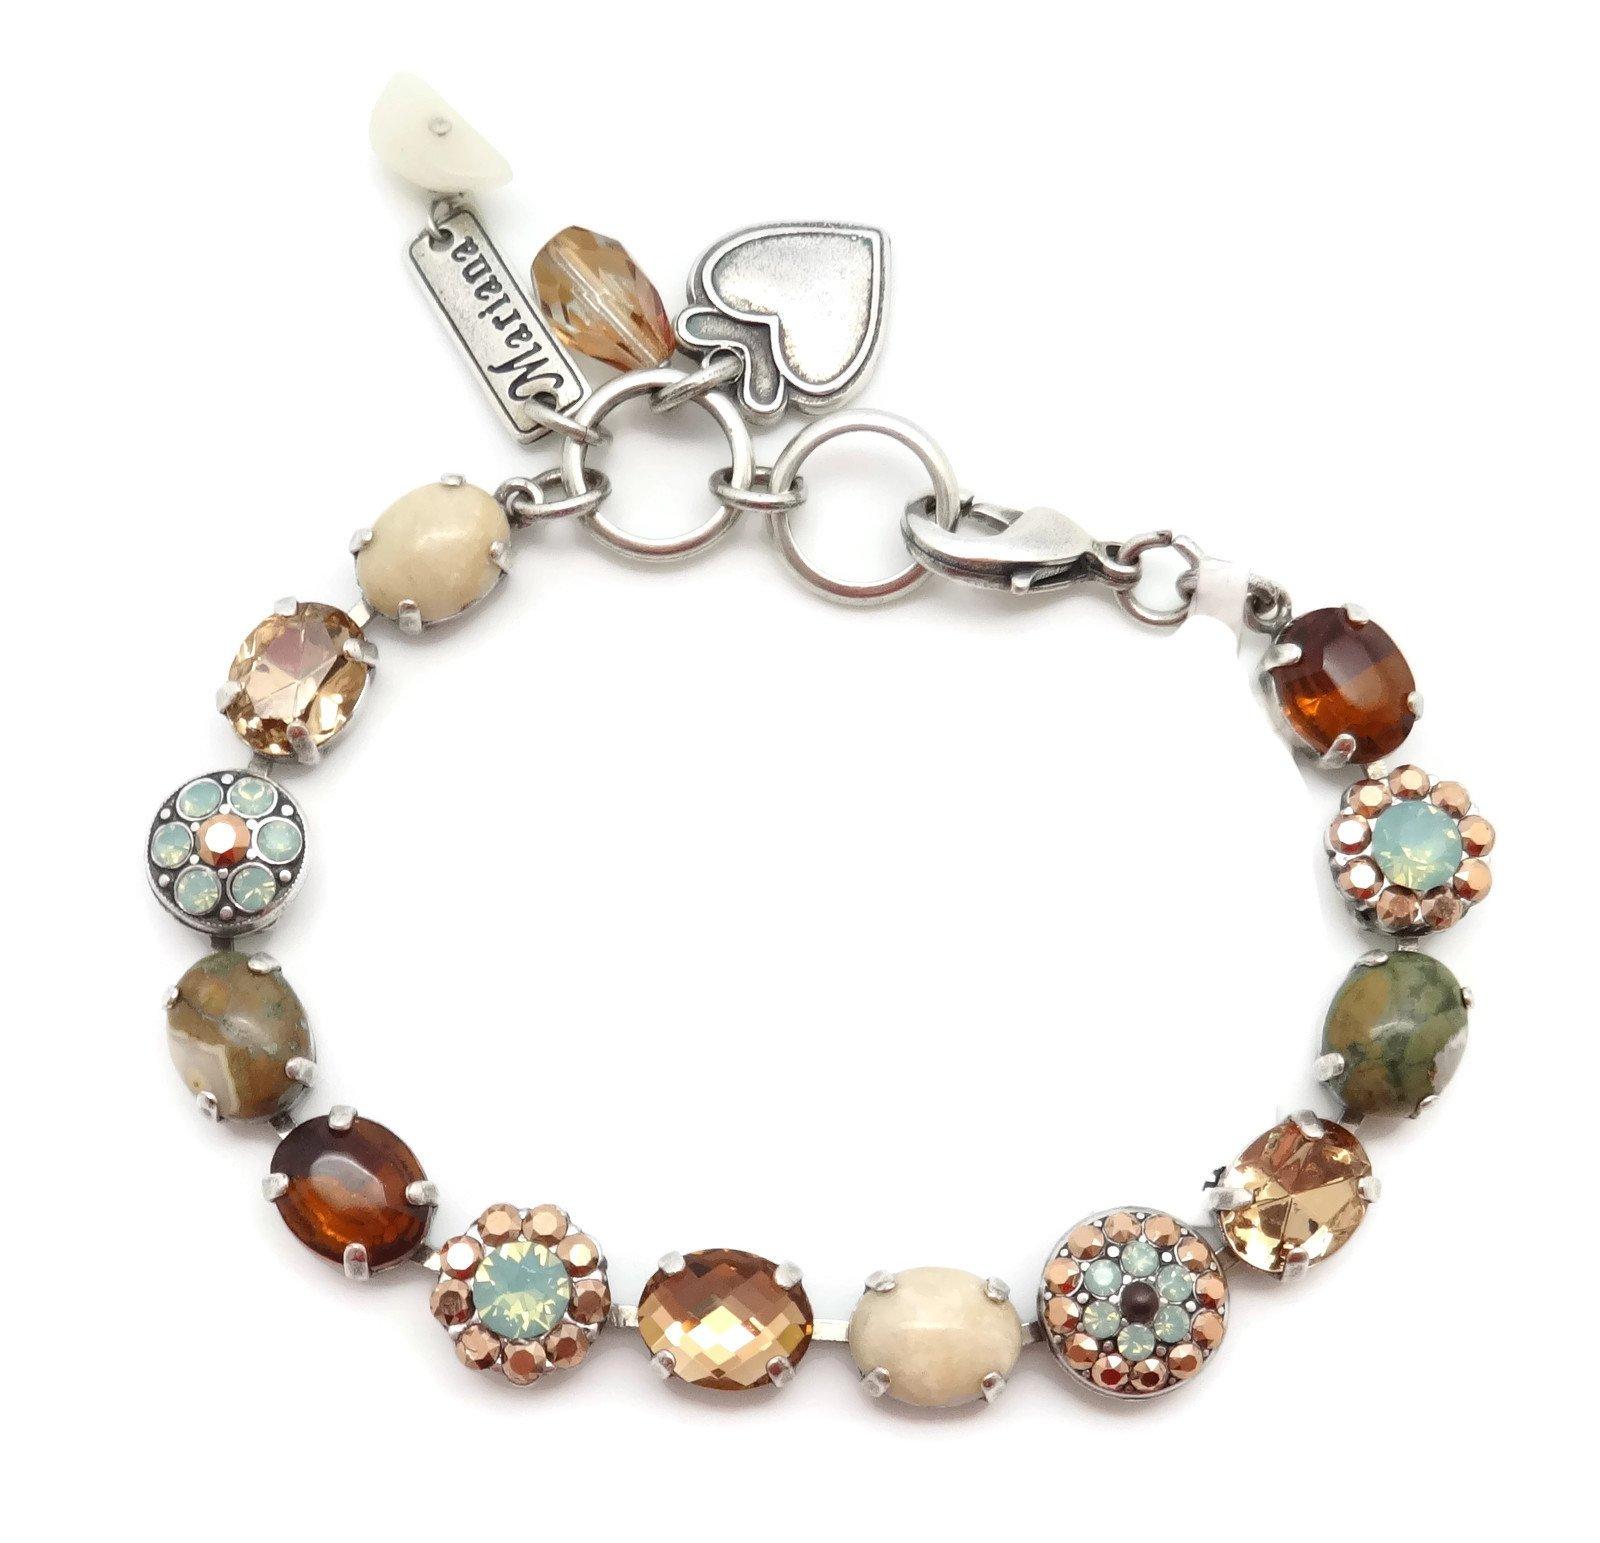 Mariana Swarovski Crystal Silver Plate Bracelet Oval Brown & Pacific Opalescent Mineral Stone Serai M1040